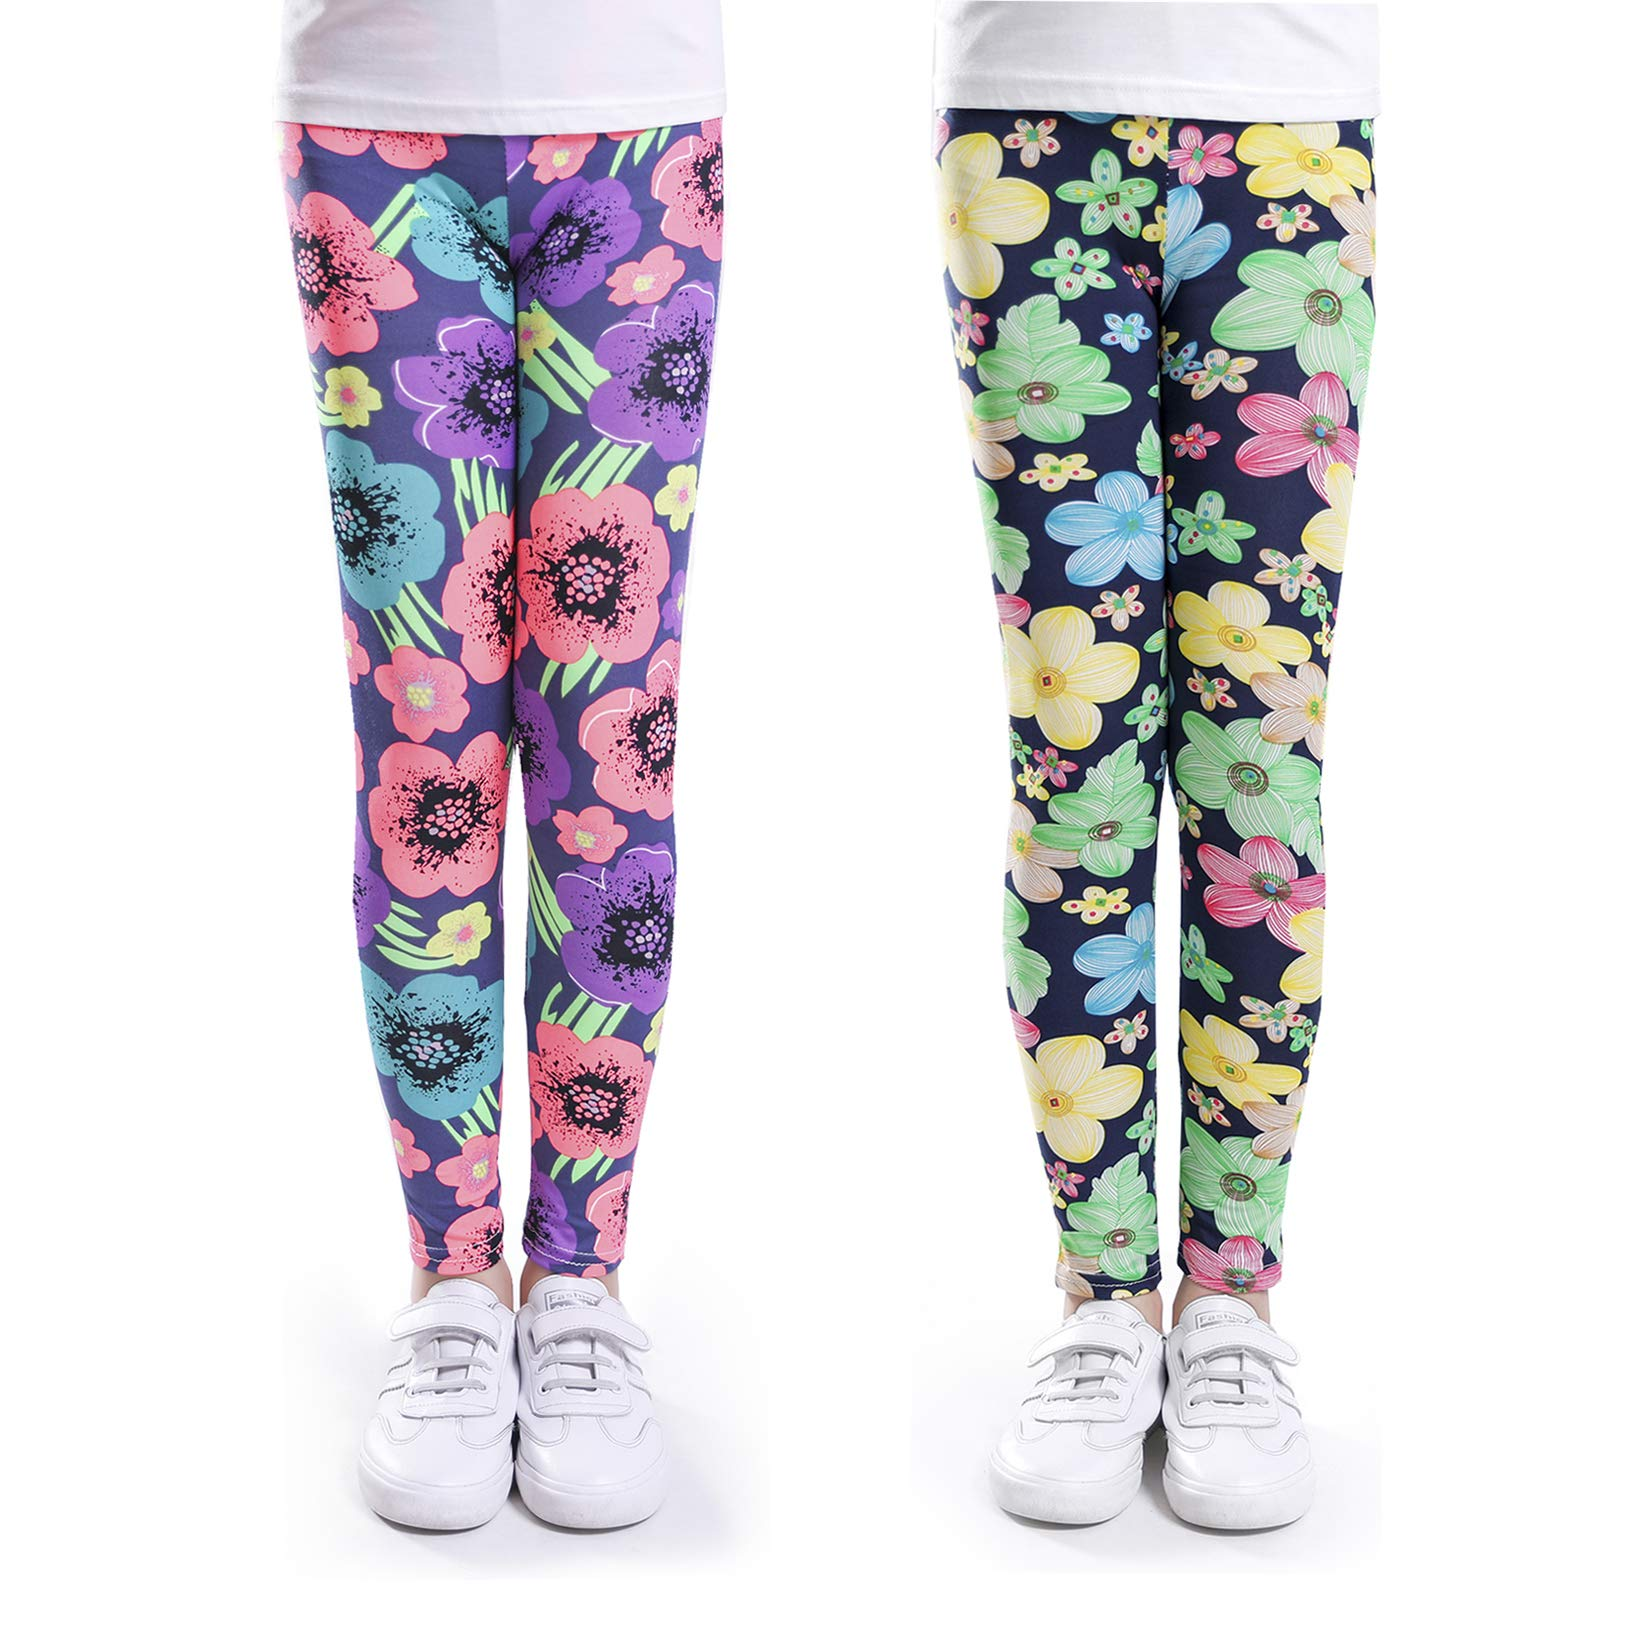 ZukoCert Stretchy Girls Leggings Tights Colorful Pattern Kids Pants 4-13 Years(C1_65#)